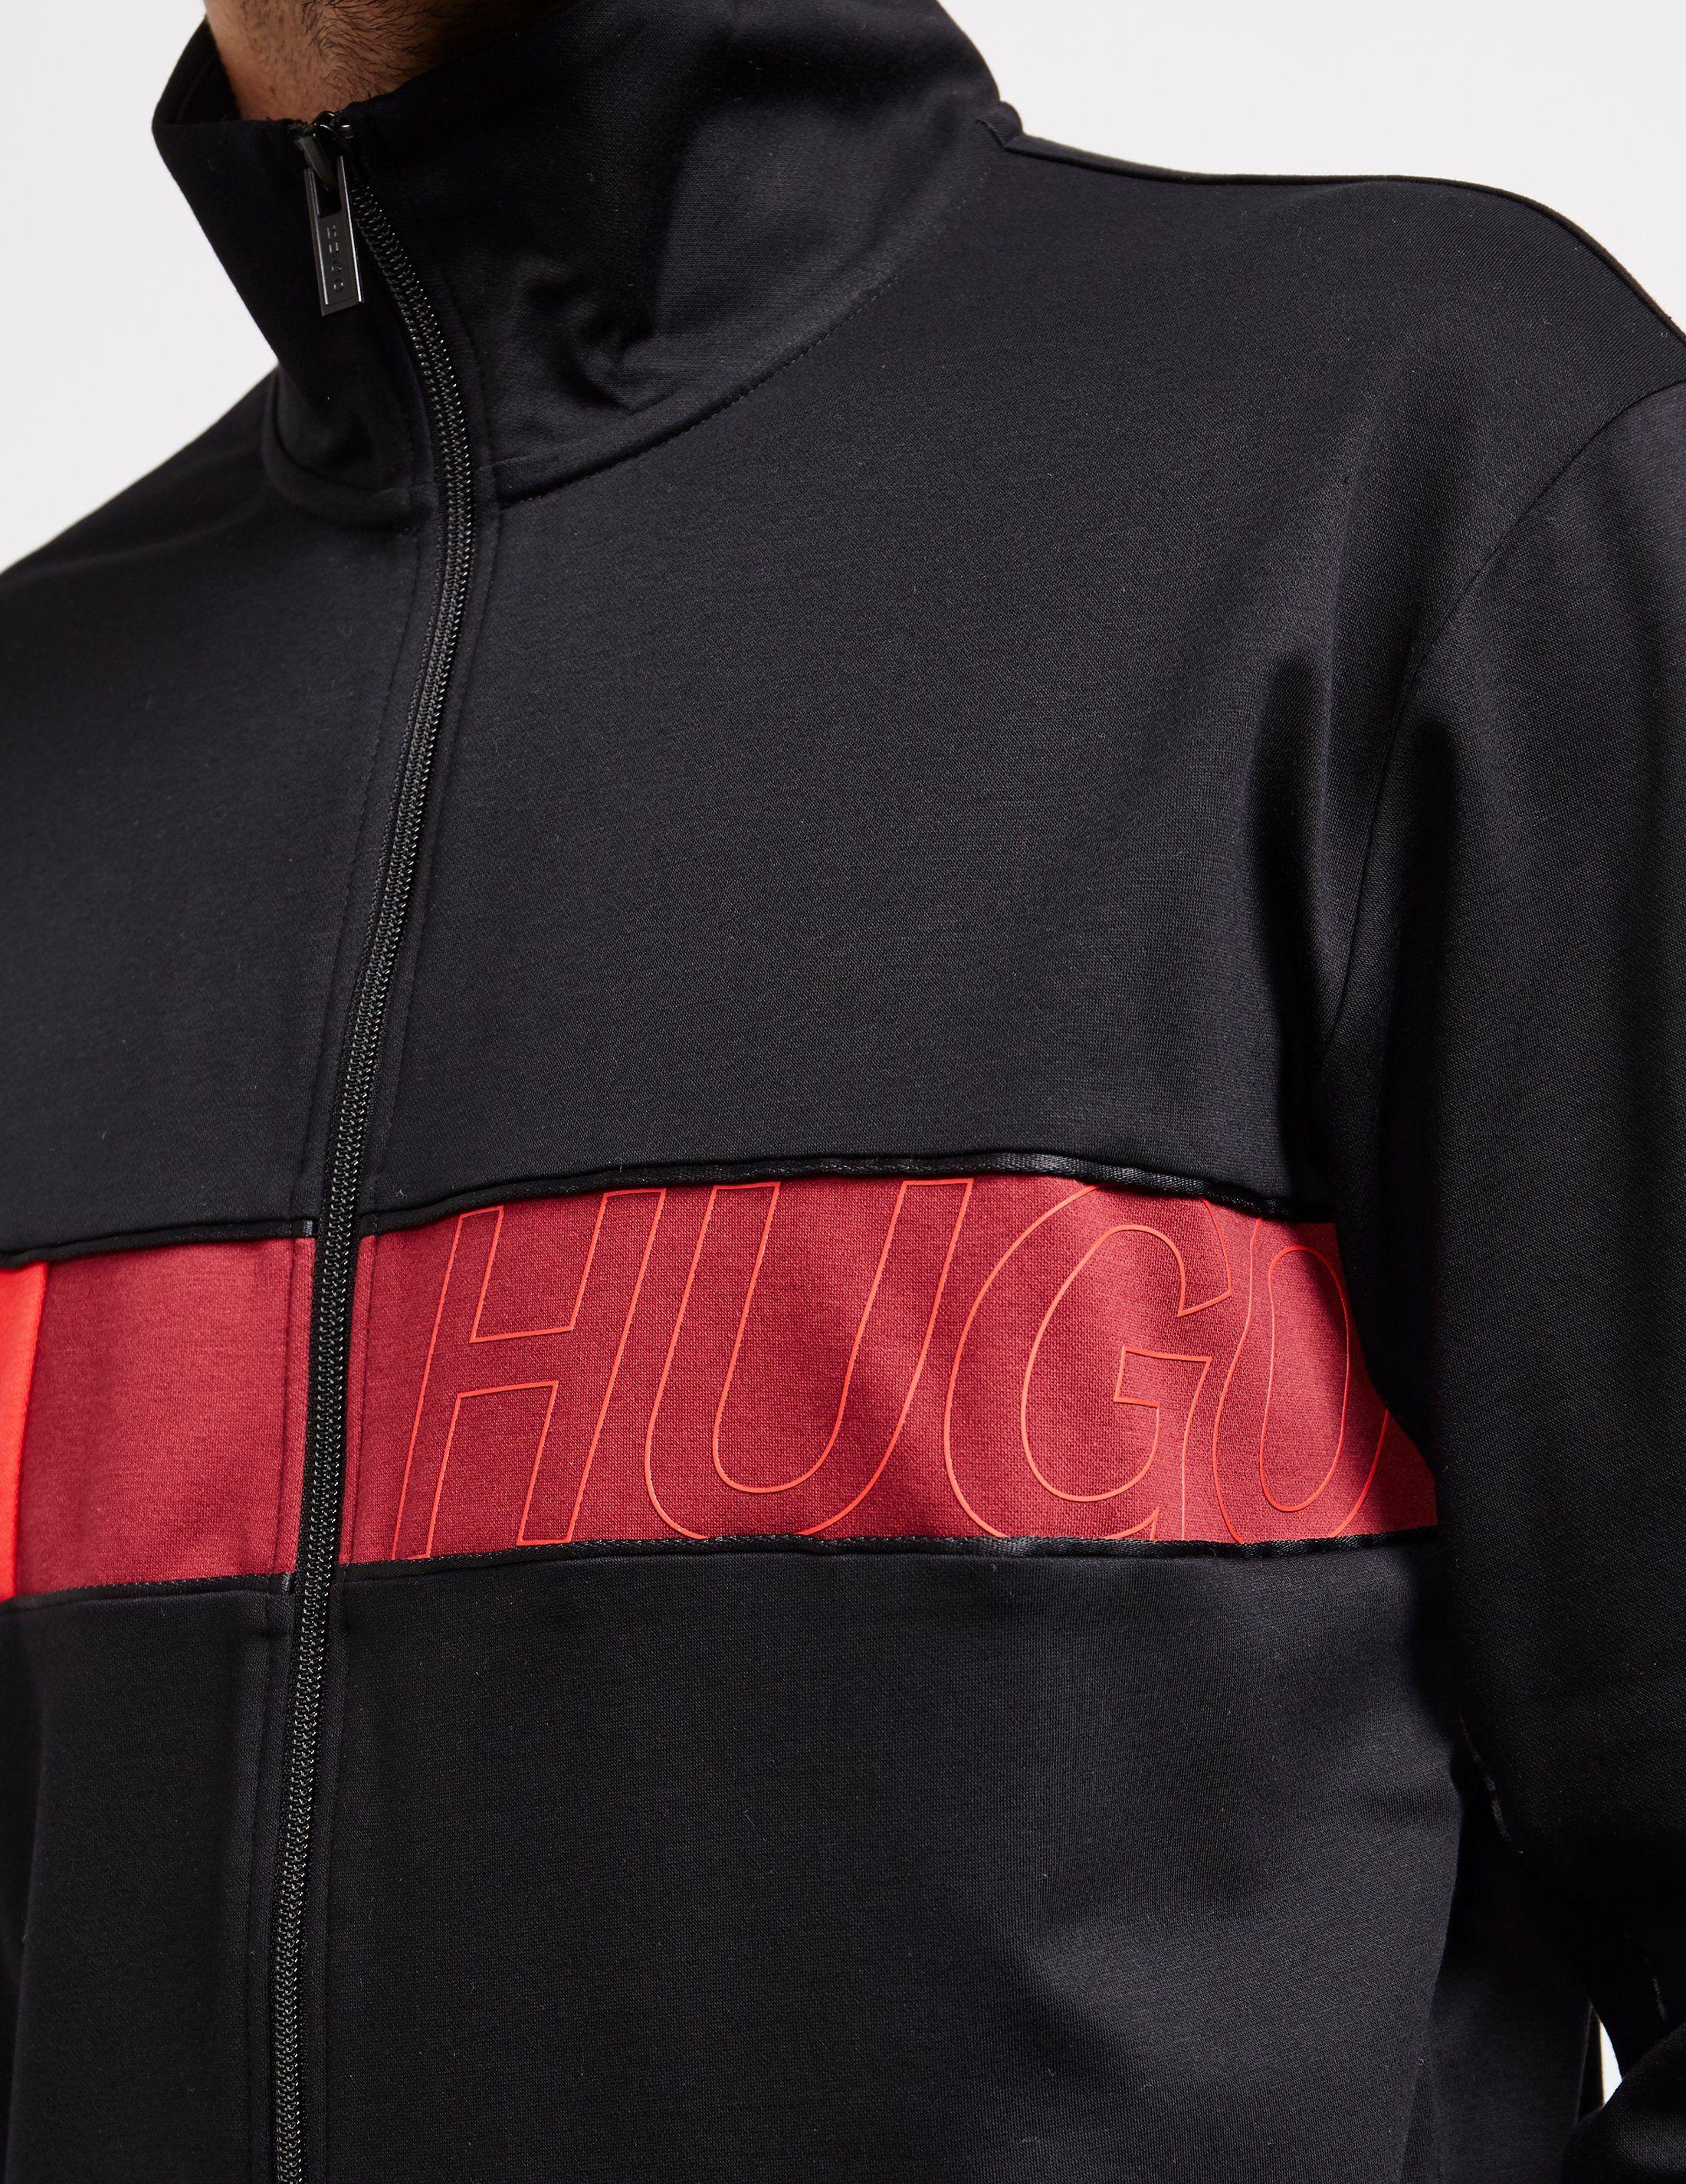 HUGO Dalias Full Zip Track Top - Online Exclusive